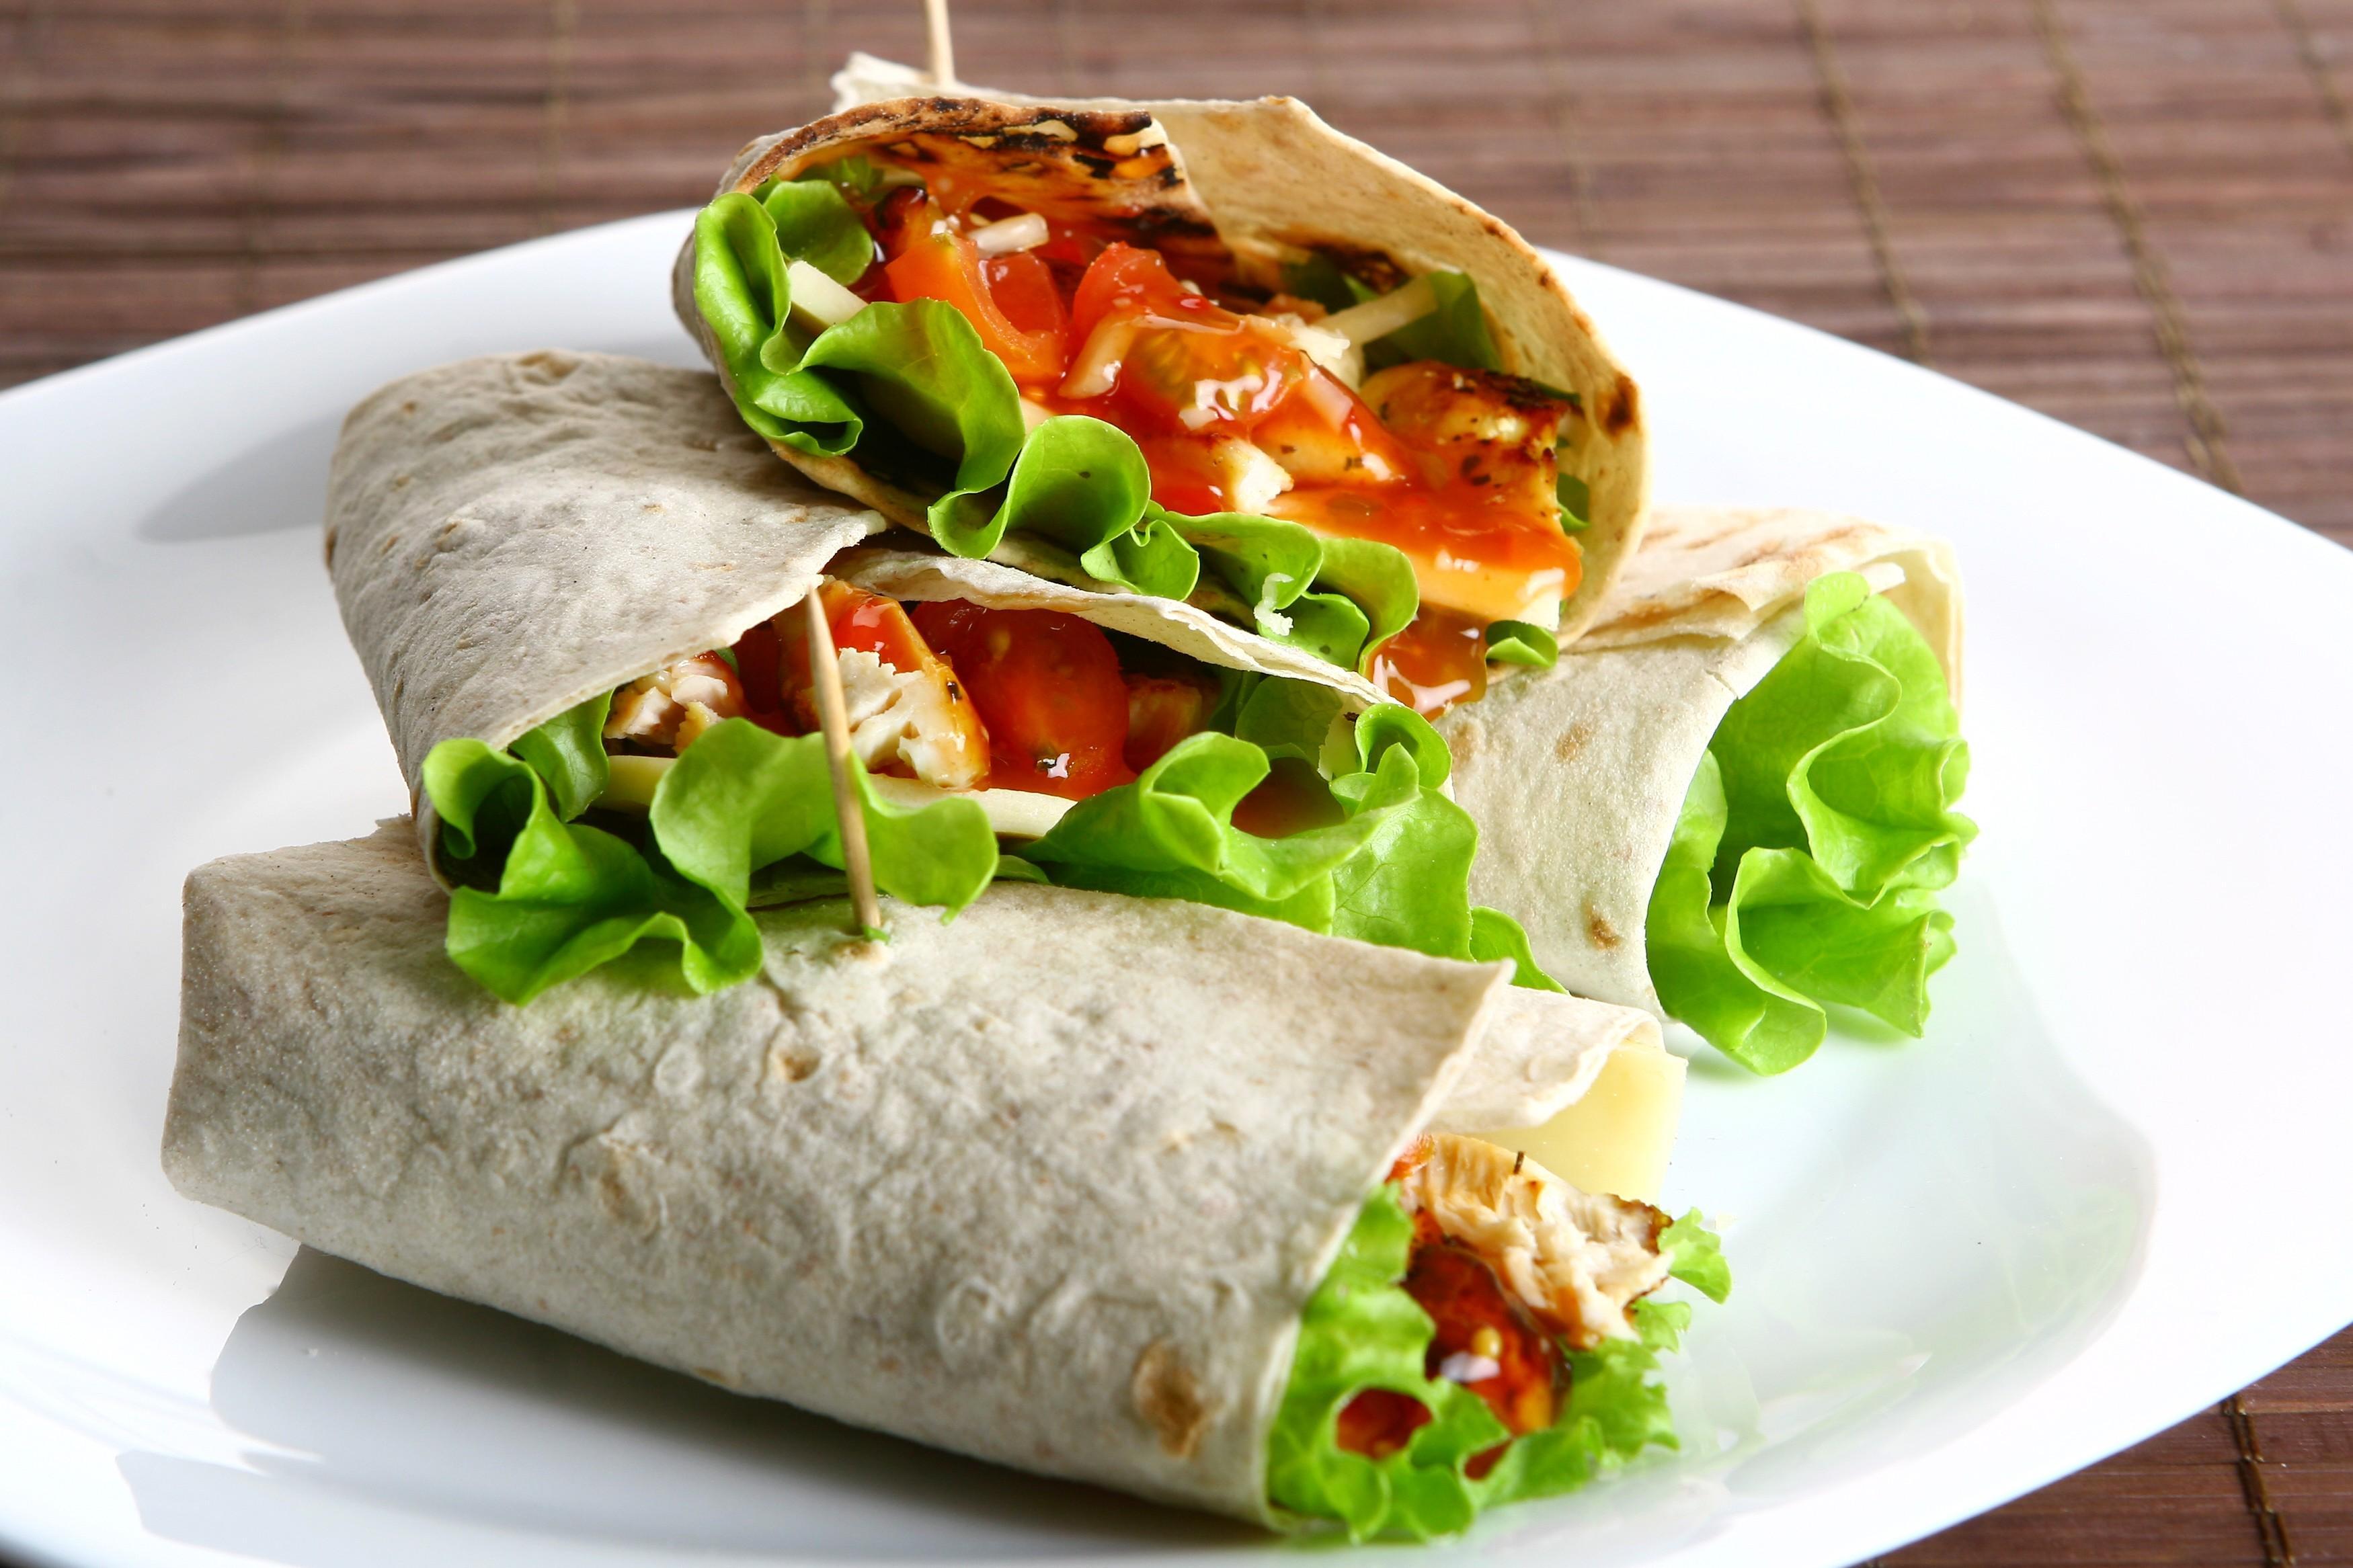 recetas de comida vegetariana faciles